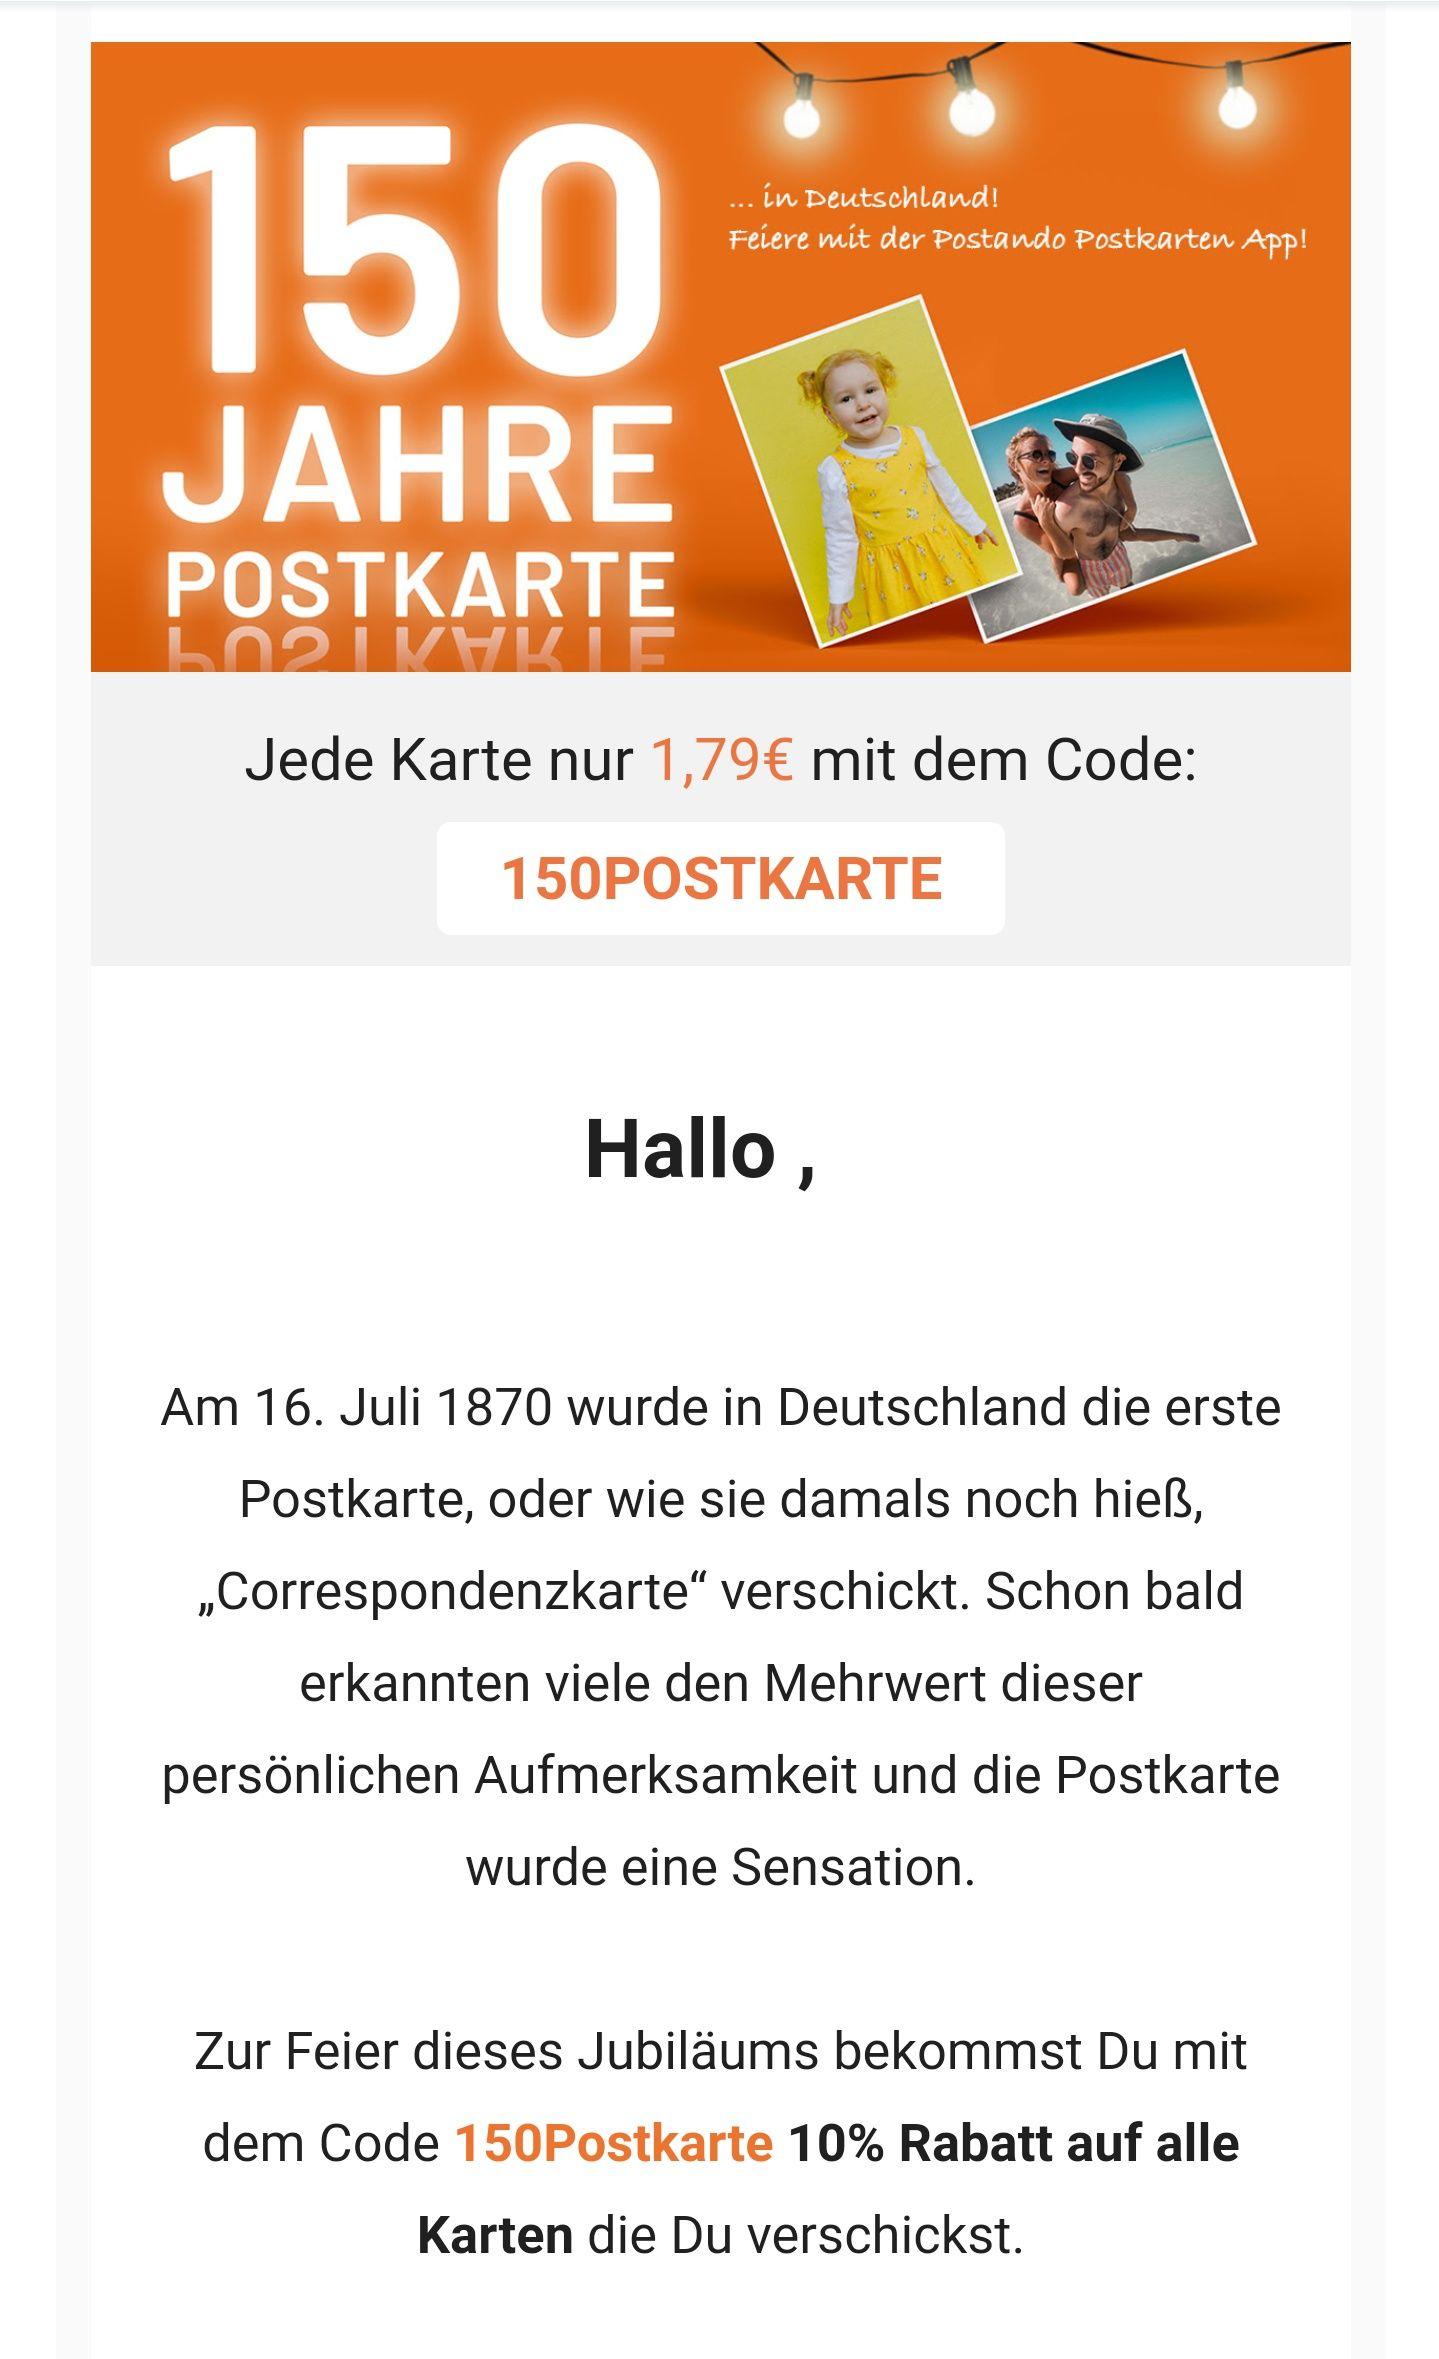 10% Auf Postkarte in Postando PostkartenApp